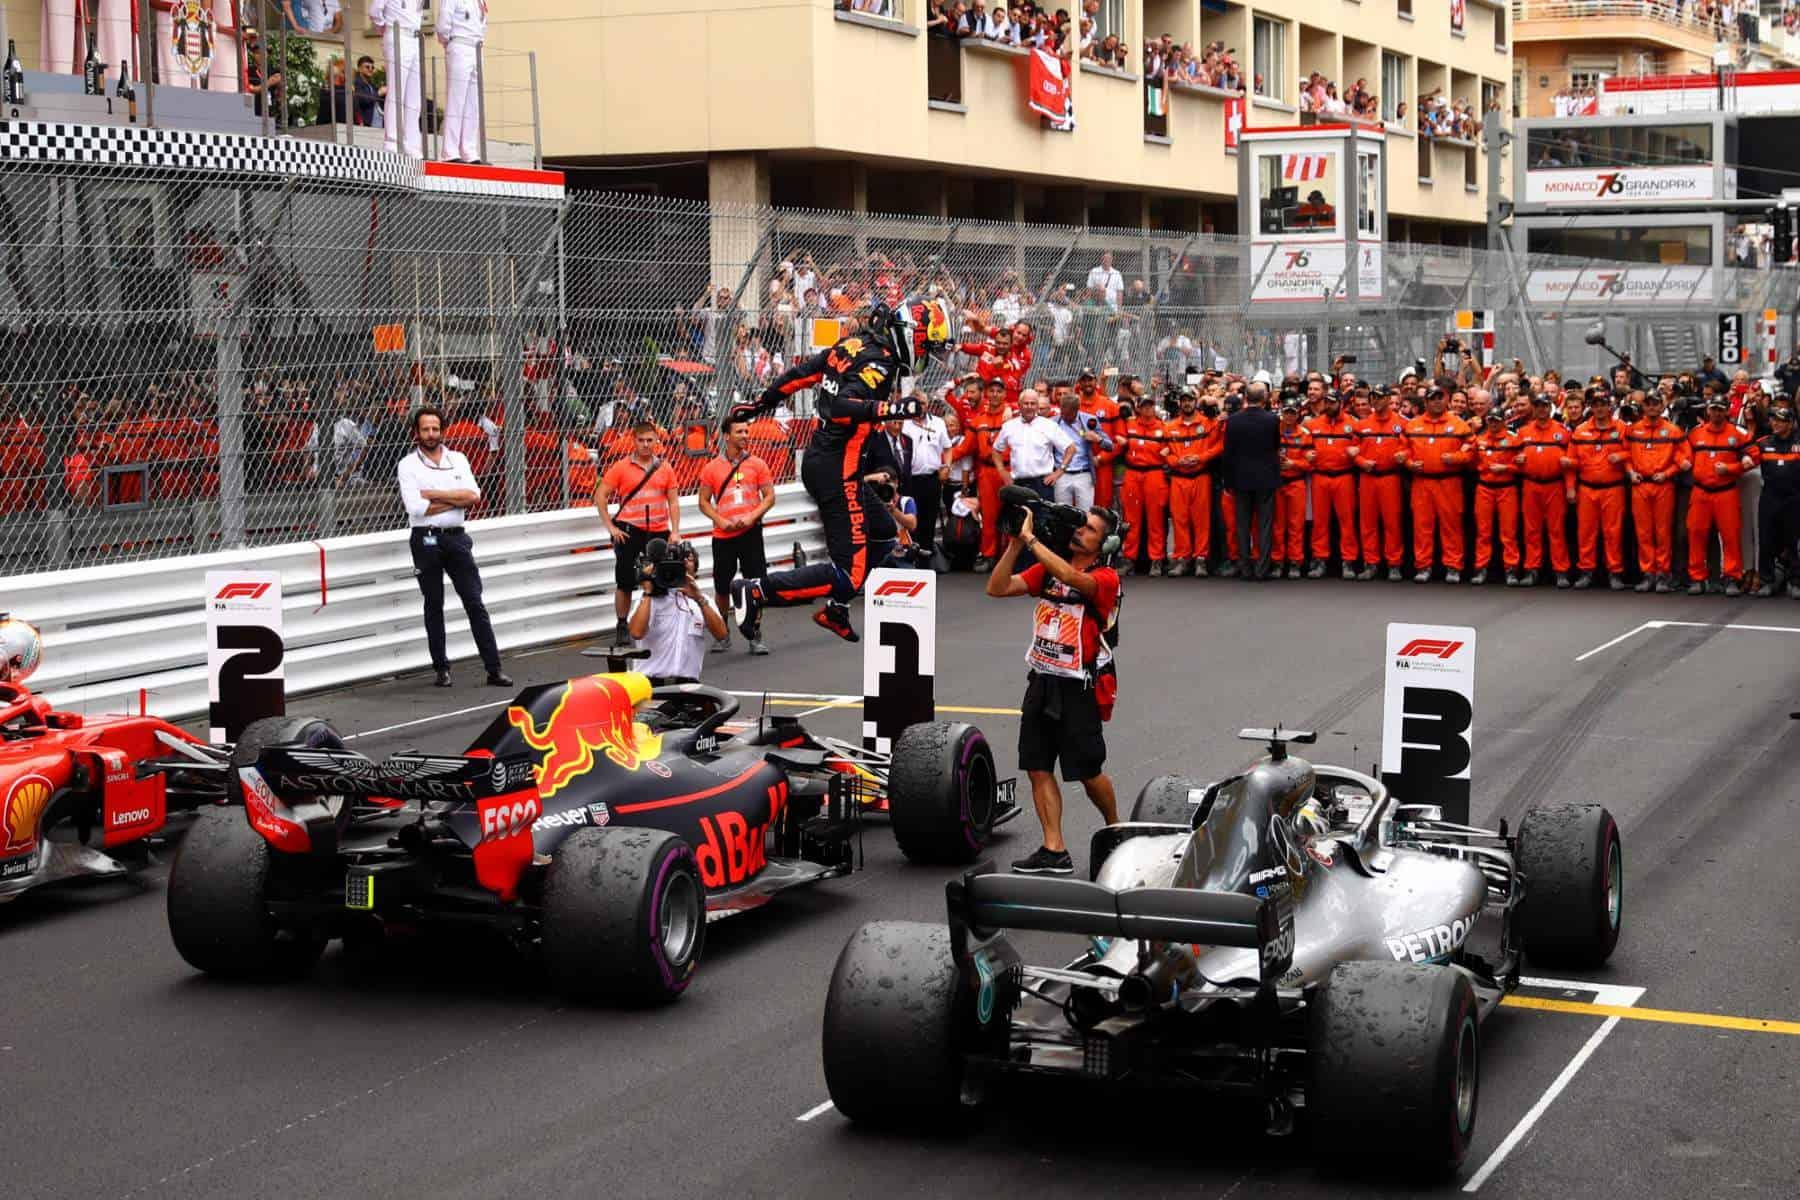 Monaco GP F1 2018 parc ferme Photo Red Bull